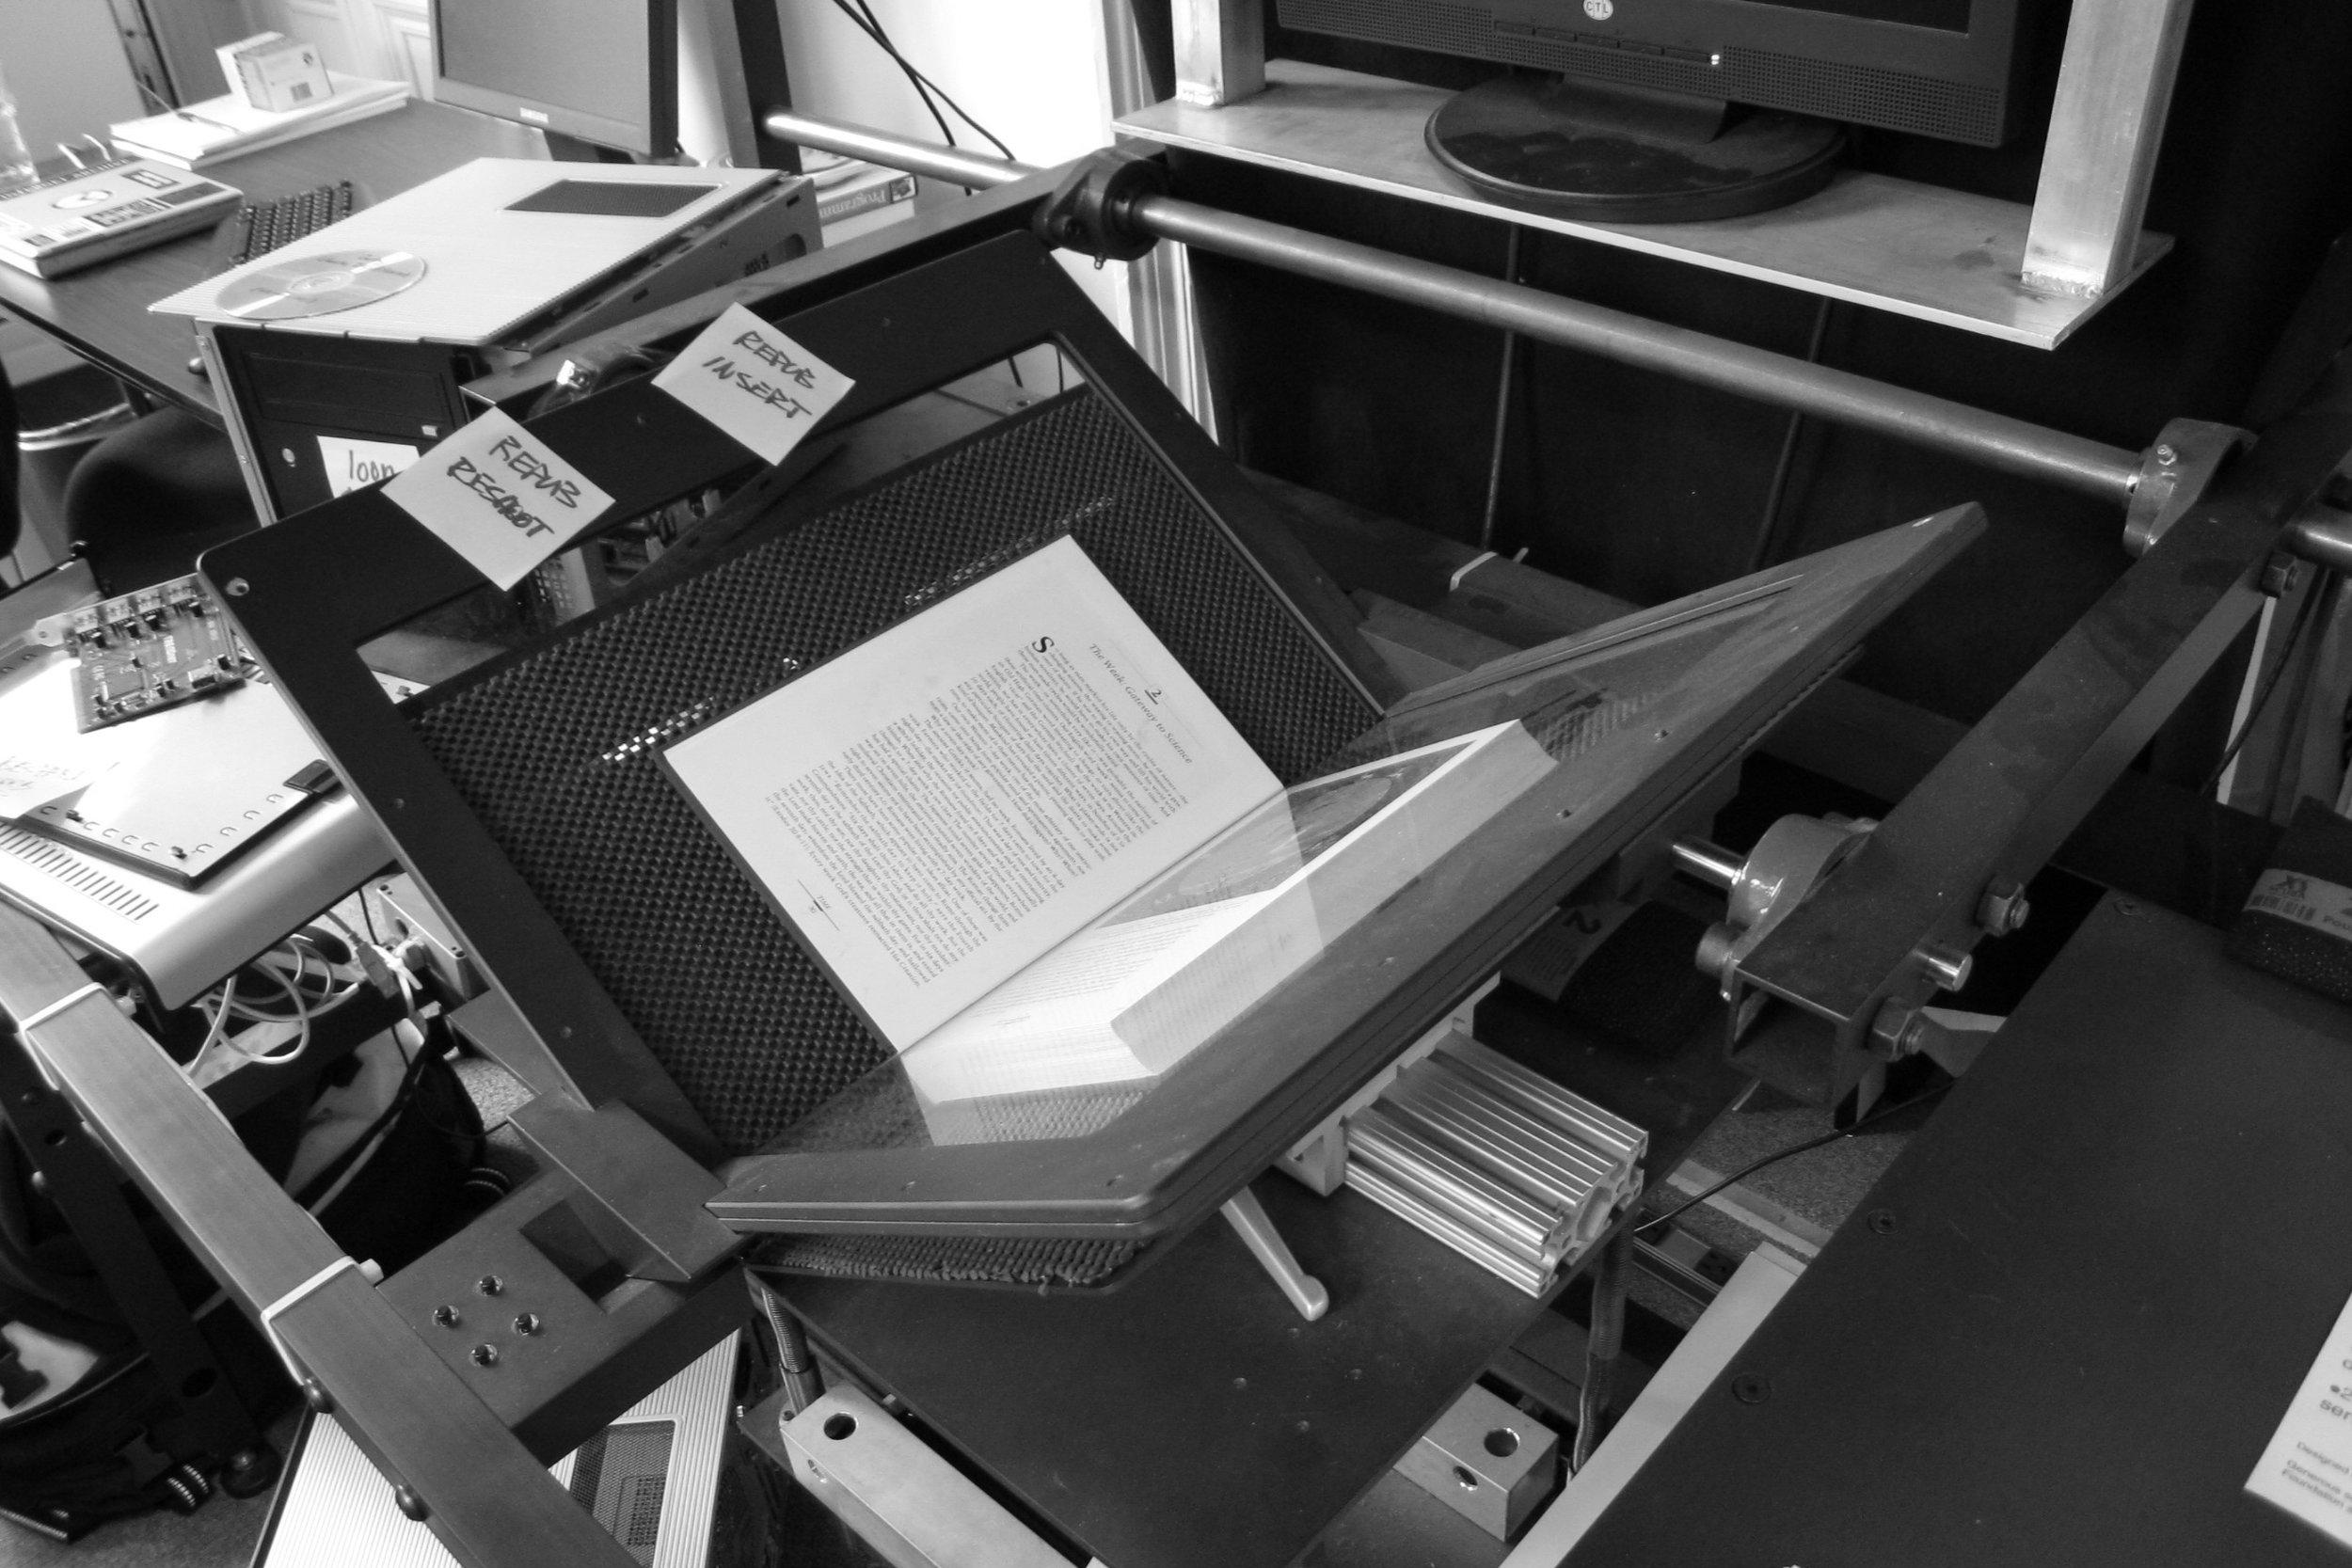 scanner b&w.jpg